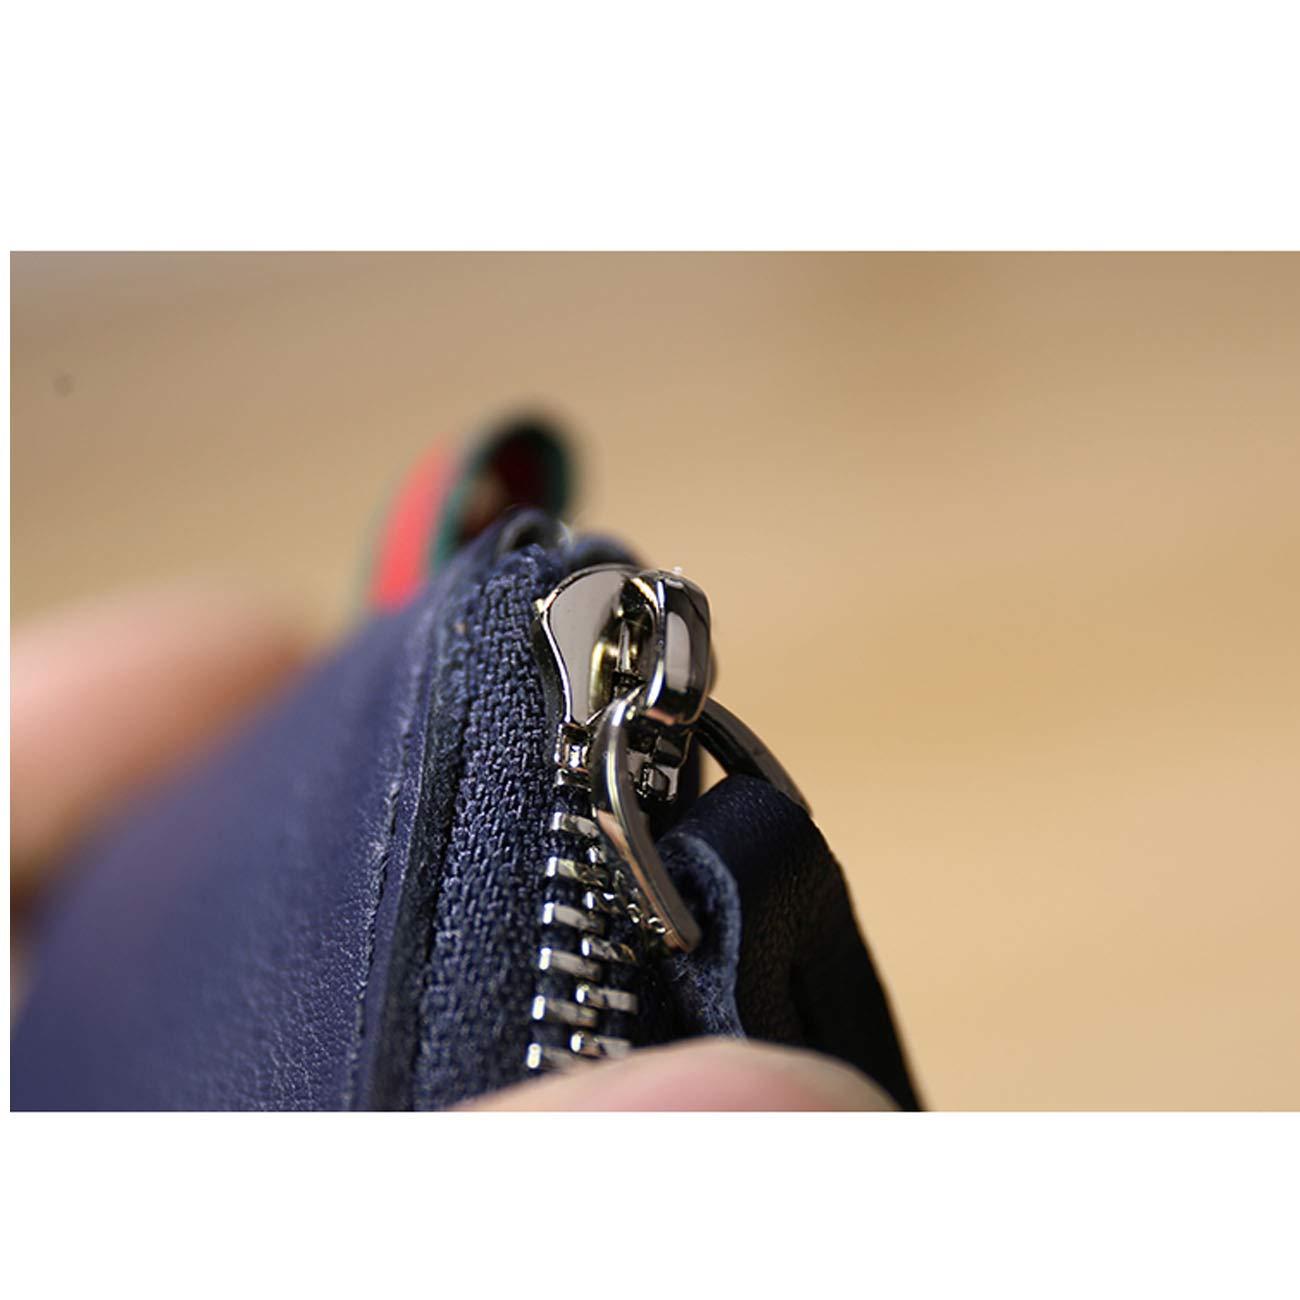 Color : Black Kalmar Money Clip Wallet RFID Blocking,Slim Wallet with Money Clip Front Pocket Wallets for Men Men with Gift Extra Capacity Travel Wallet Minimalist,Mini Slim Wallets